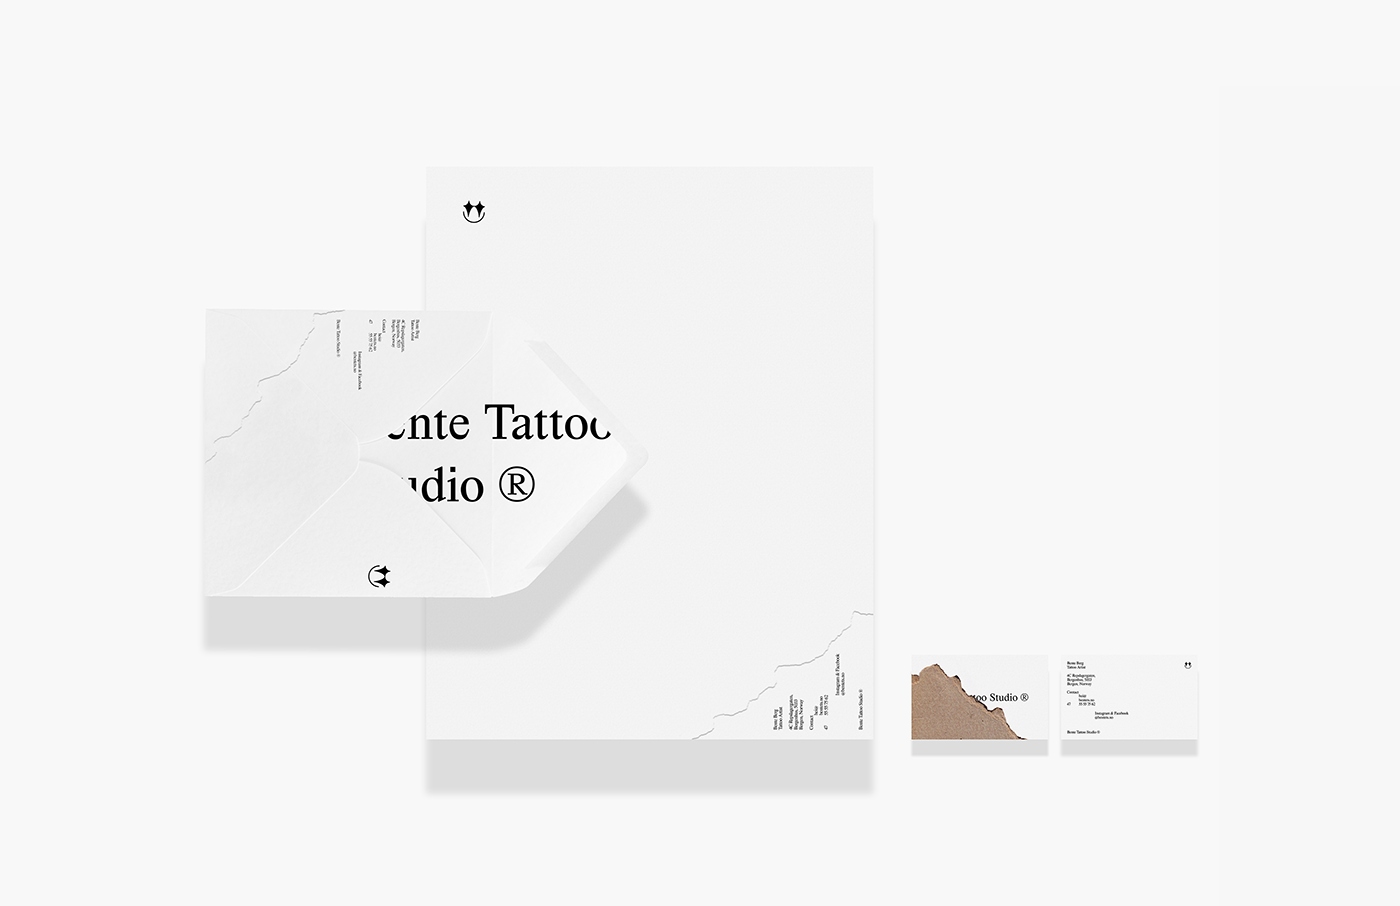 Brand Identity for Bente Tattoo Studio in Norway